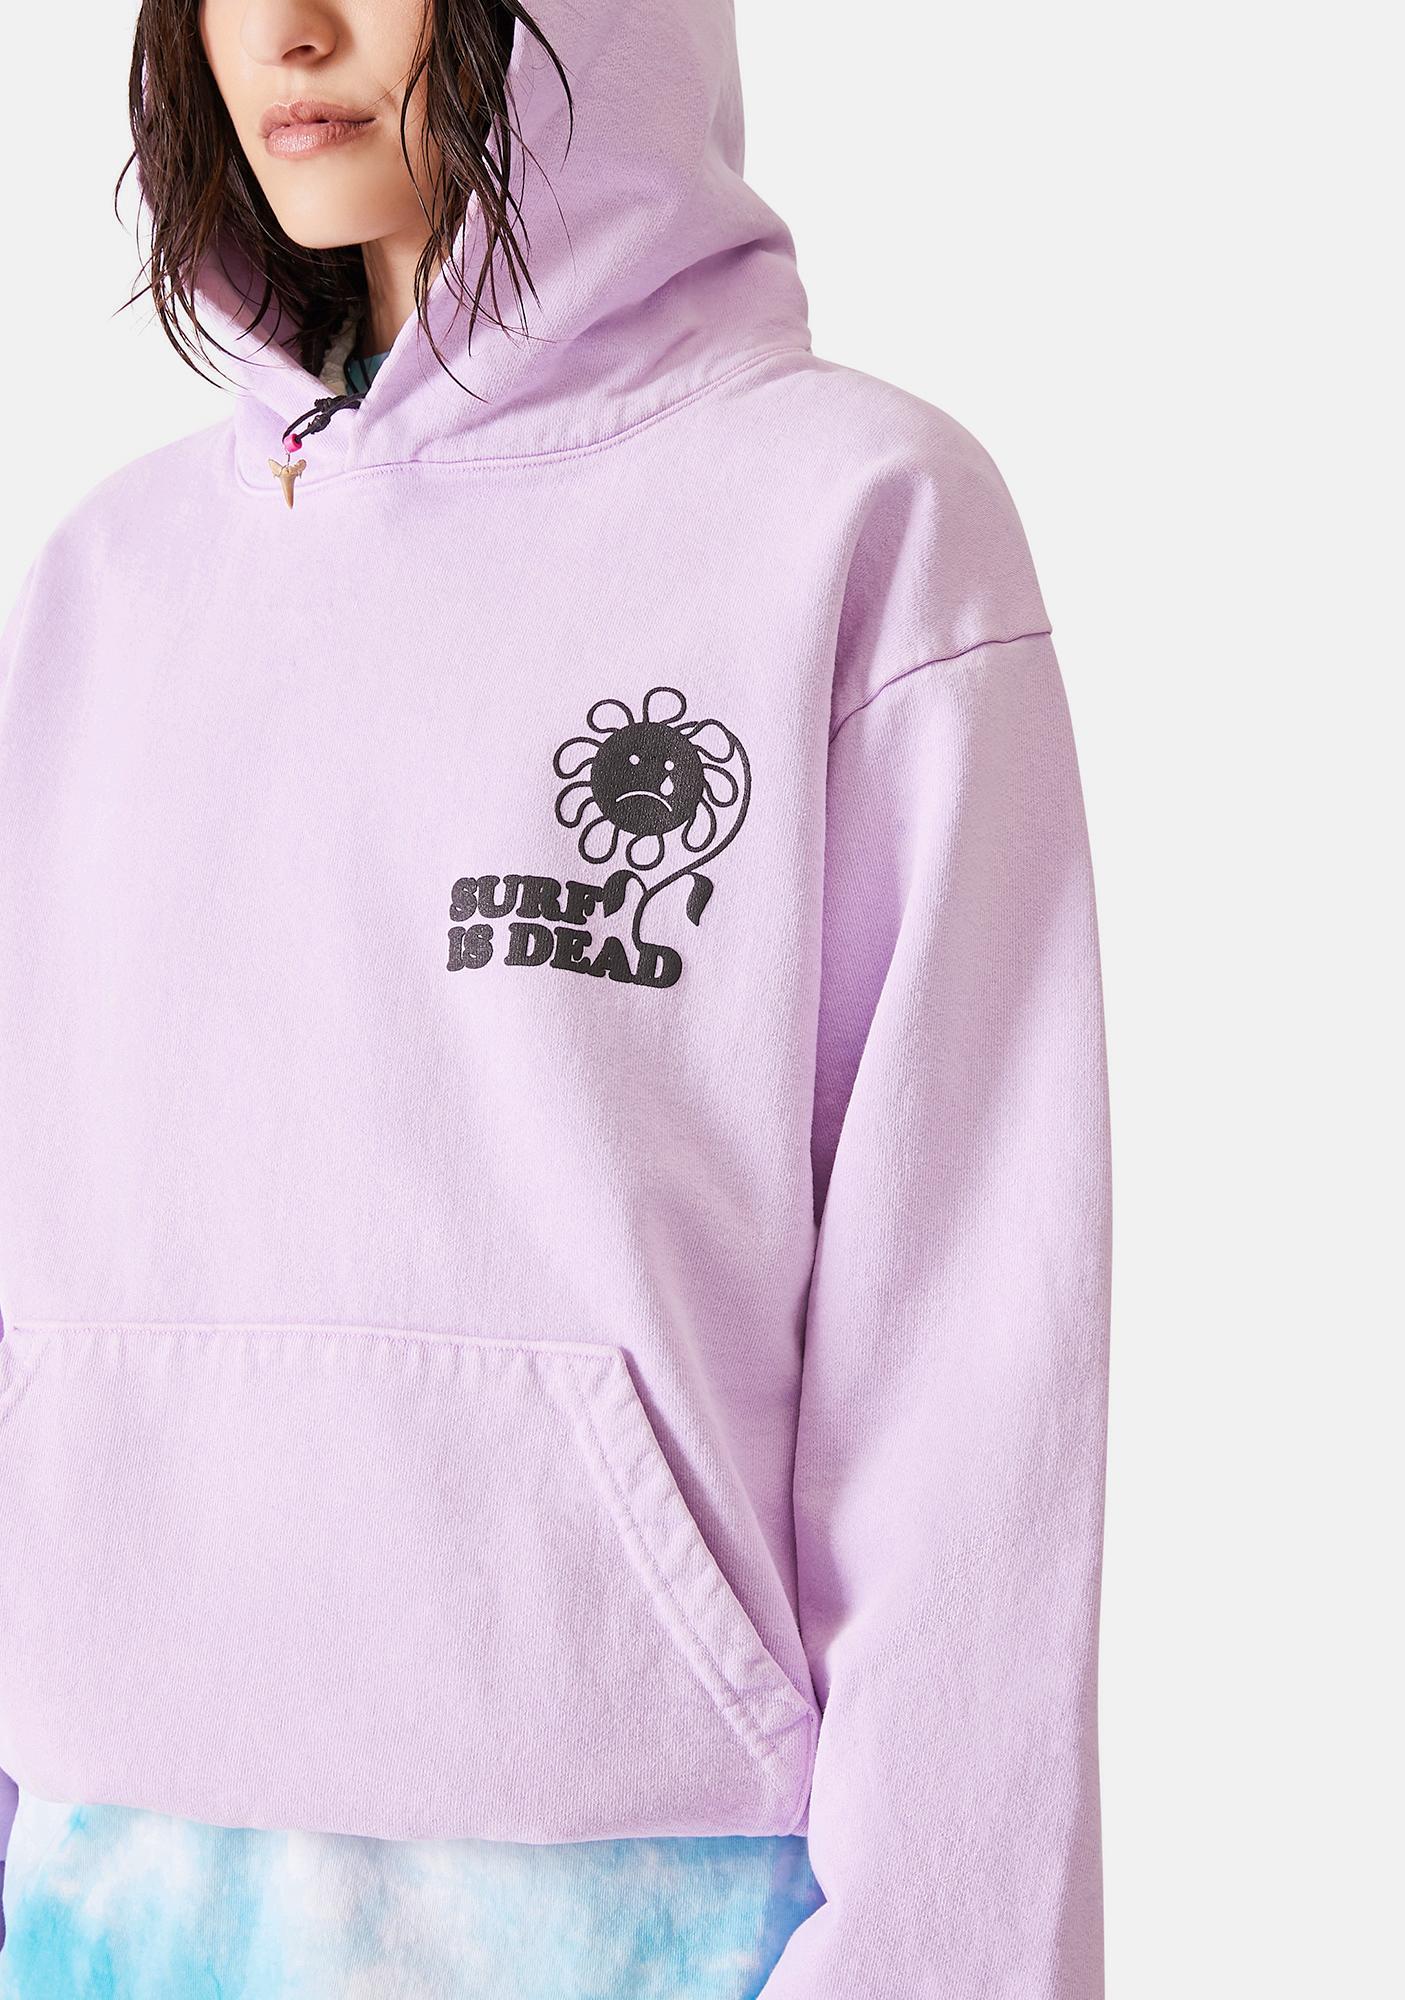 Surf is Dead Sad Flower Graphic Hoodie